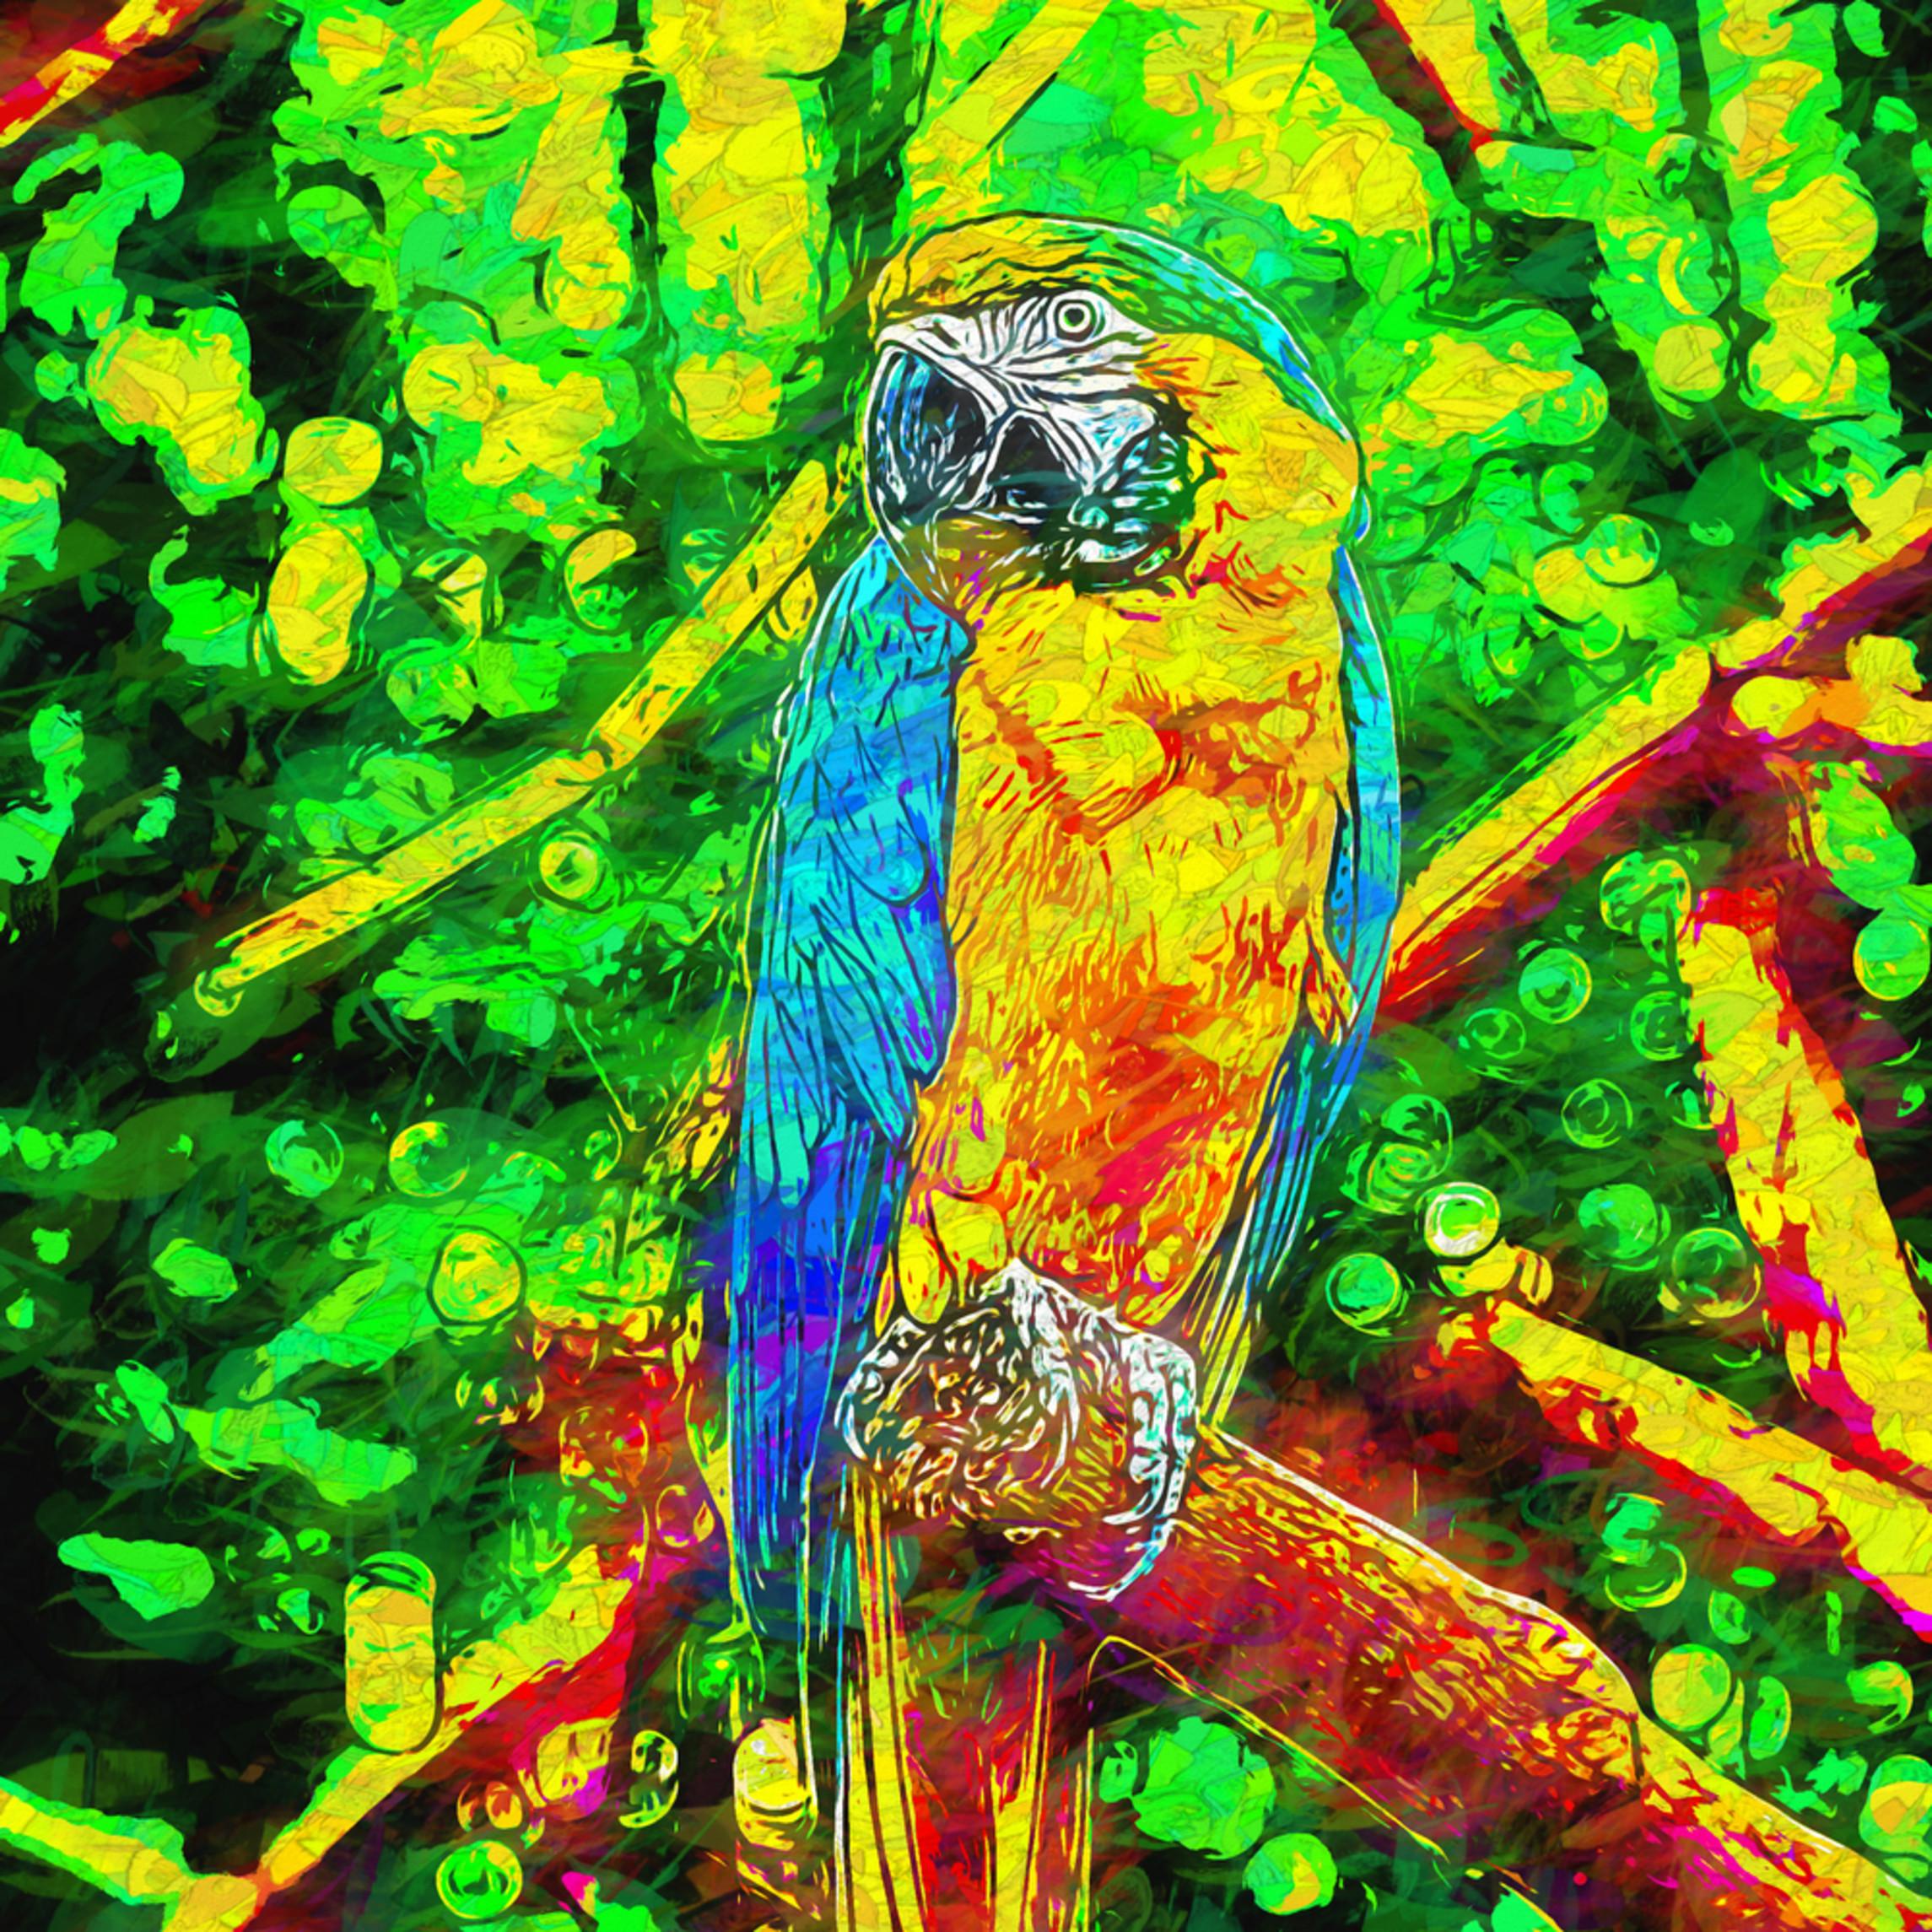 Papagaio2 vbnatk